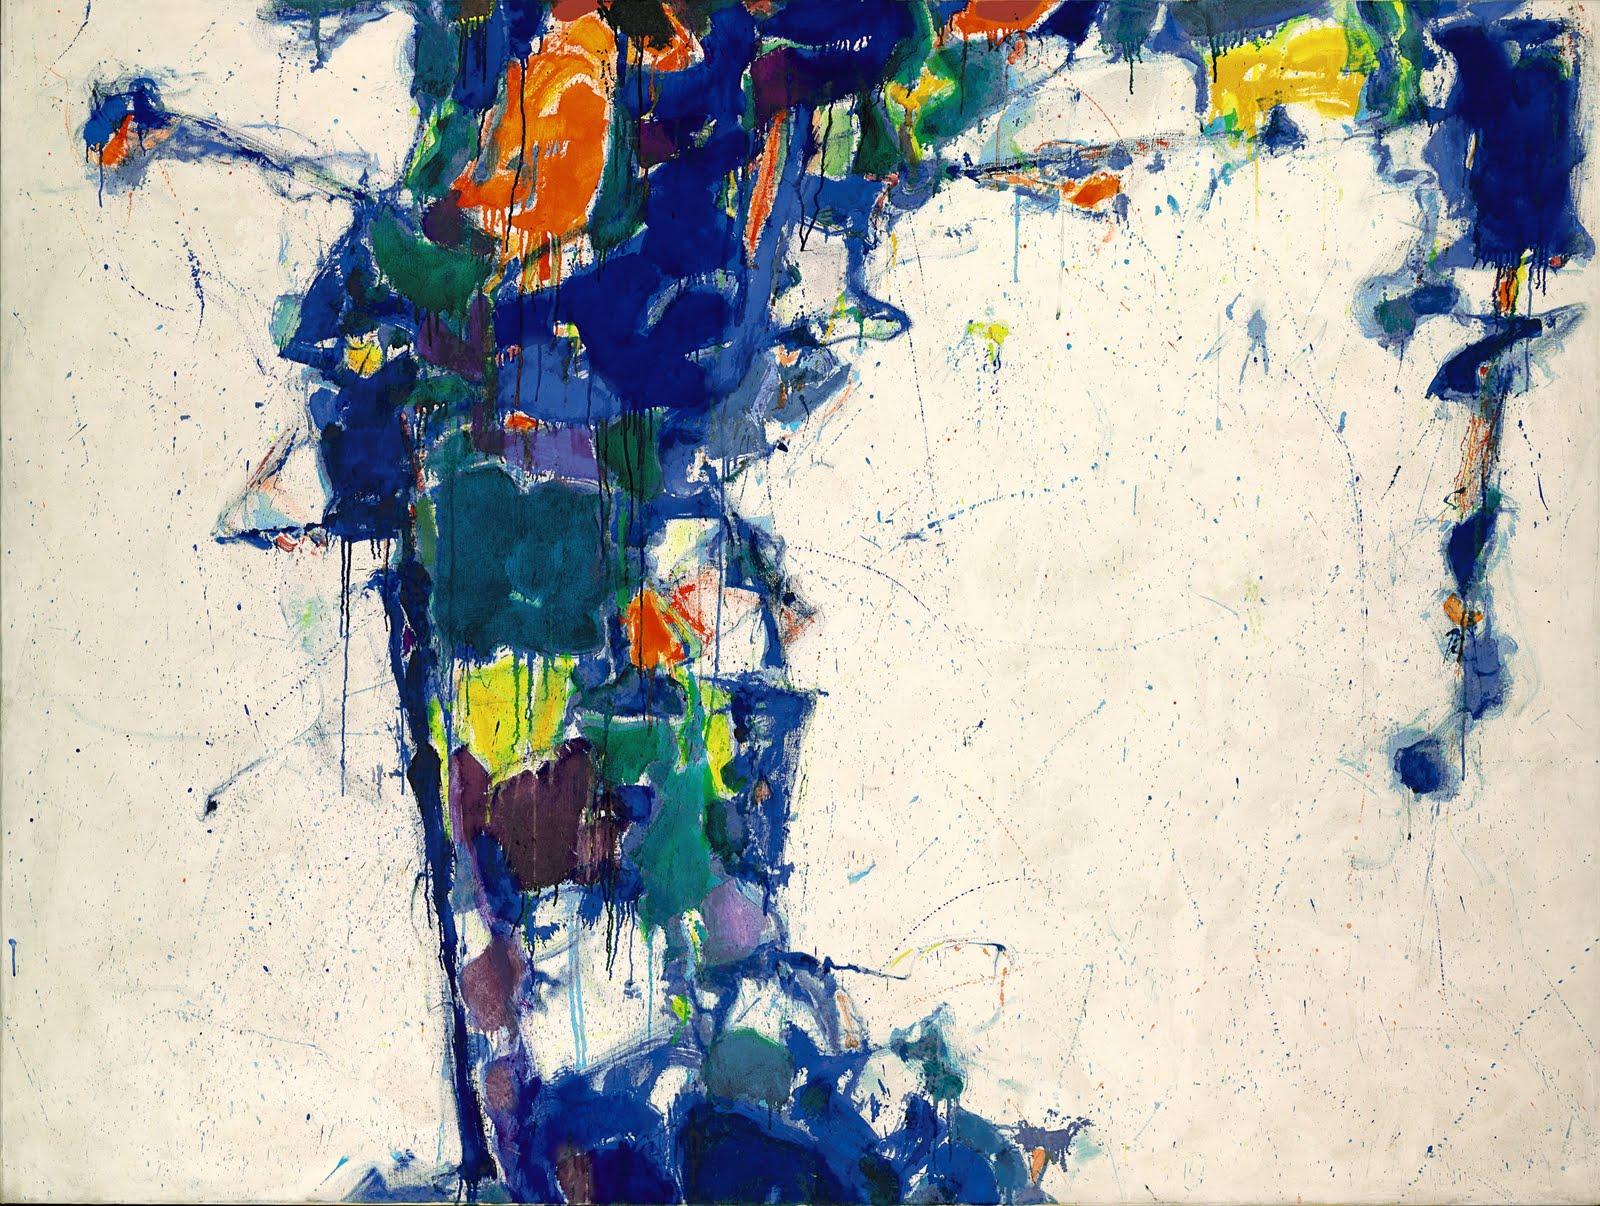 Sam Francis Middle Blue, 1957 oil on canvas